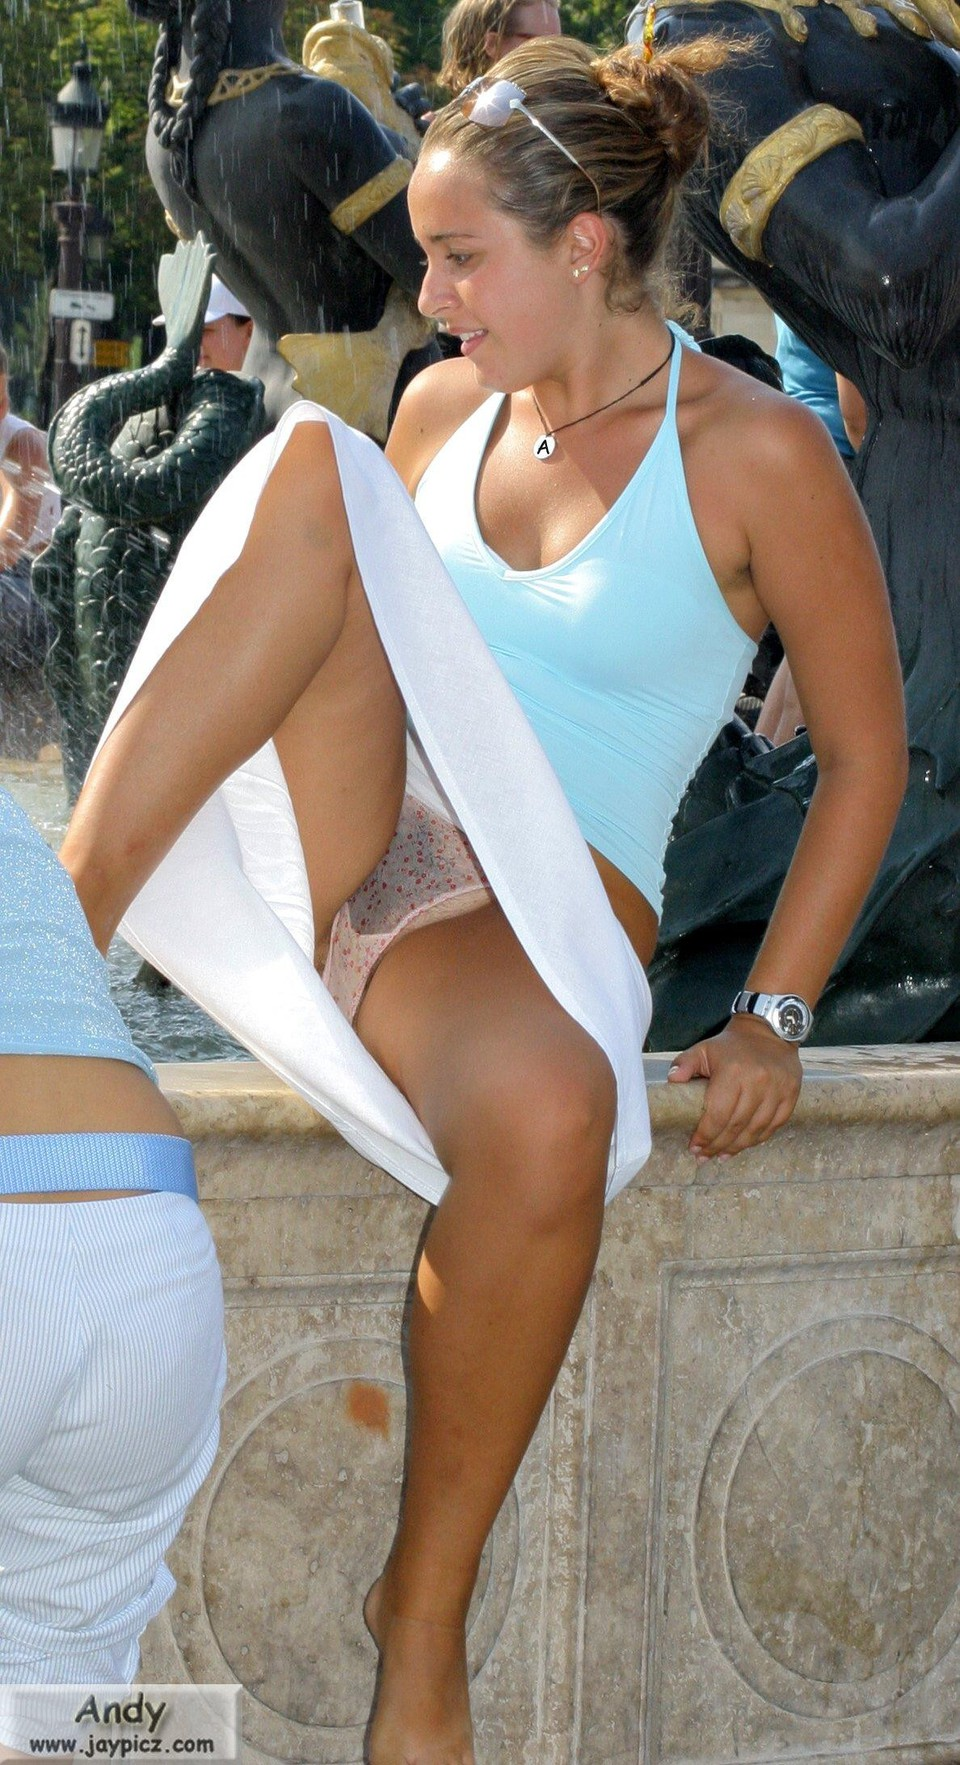 Femme amatrice en culotte